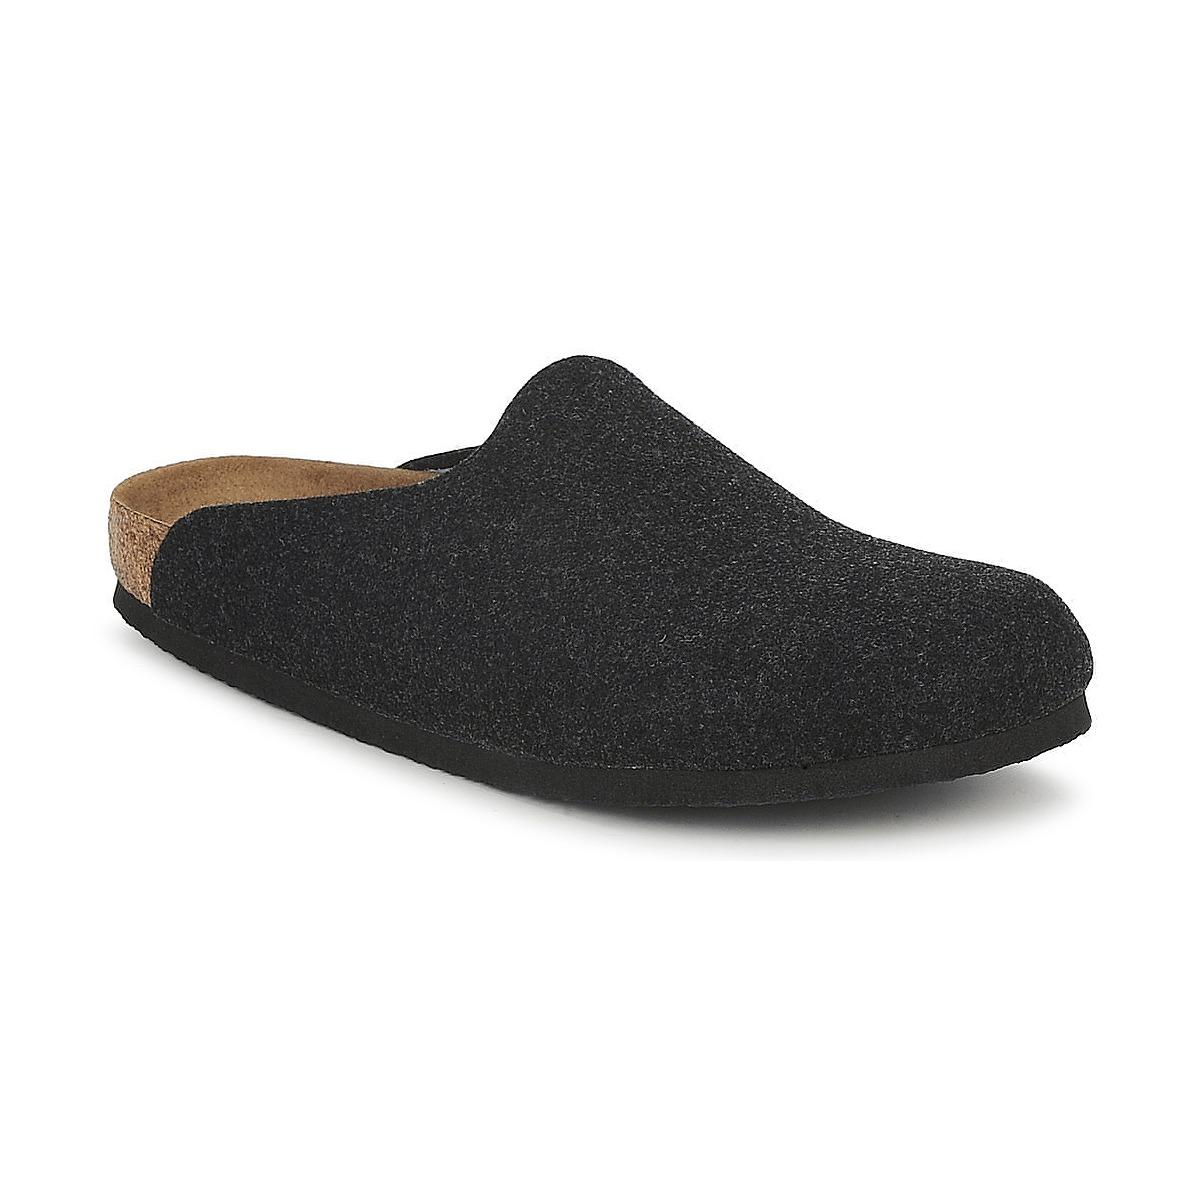 Birkenstock AMSTERDAM Grau - Kostenloser Versand bei Spartoode ! - Schuhe Pantoletten / Clogs  47,99 €